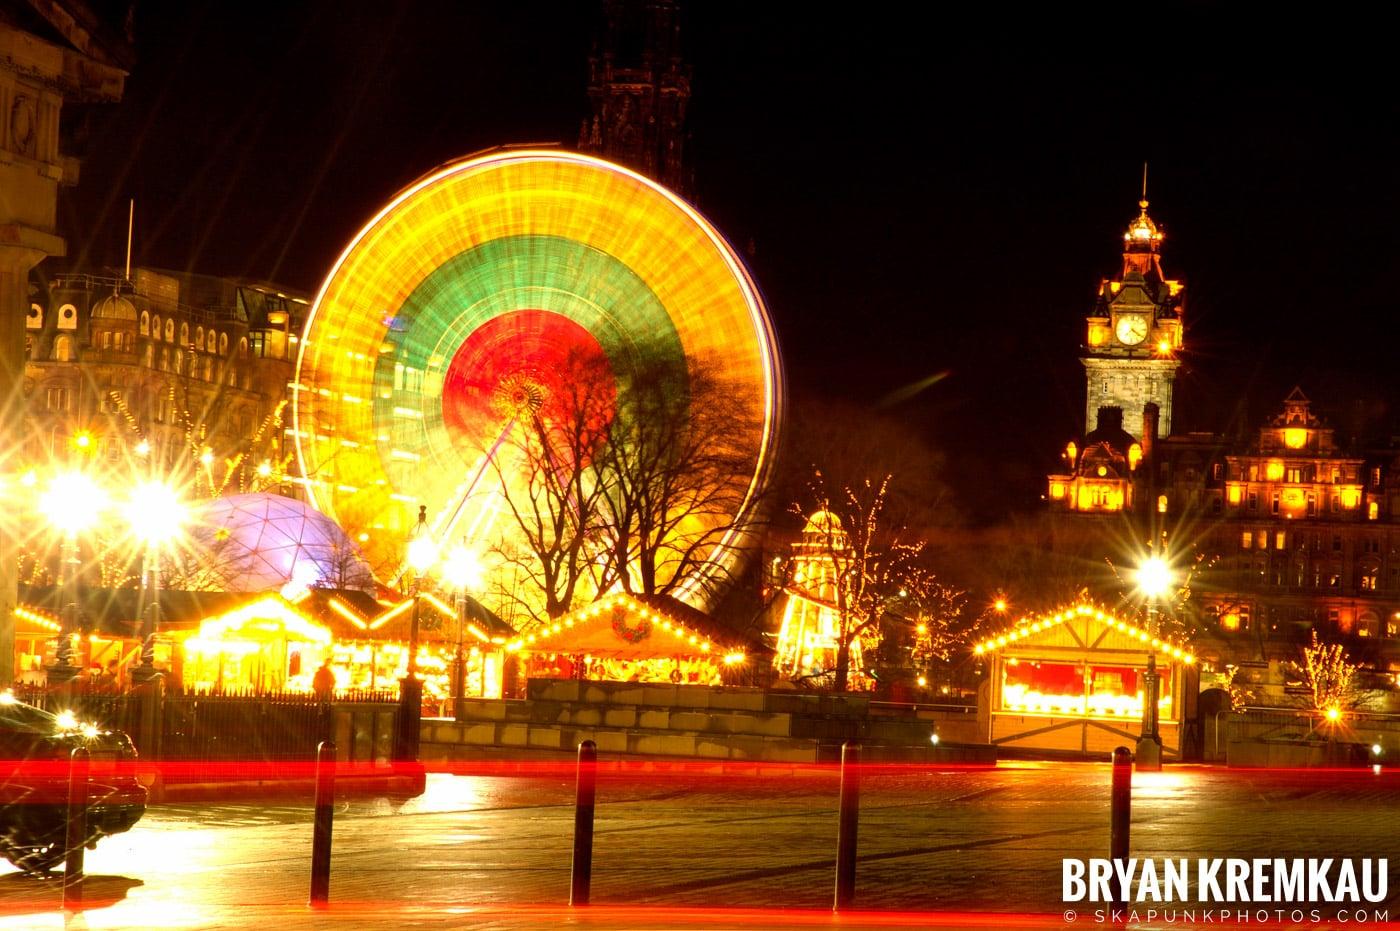 Edinburgh, Scotland - Day 1 - 12.12.06 (9)